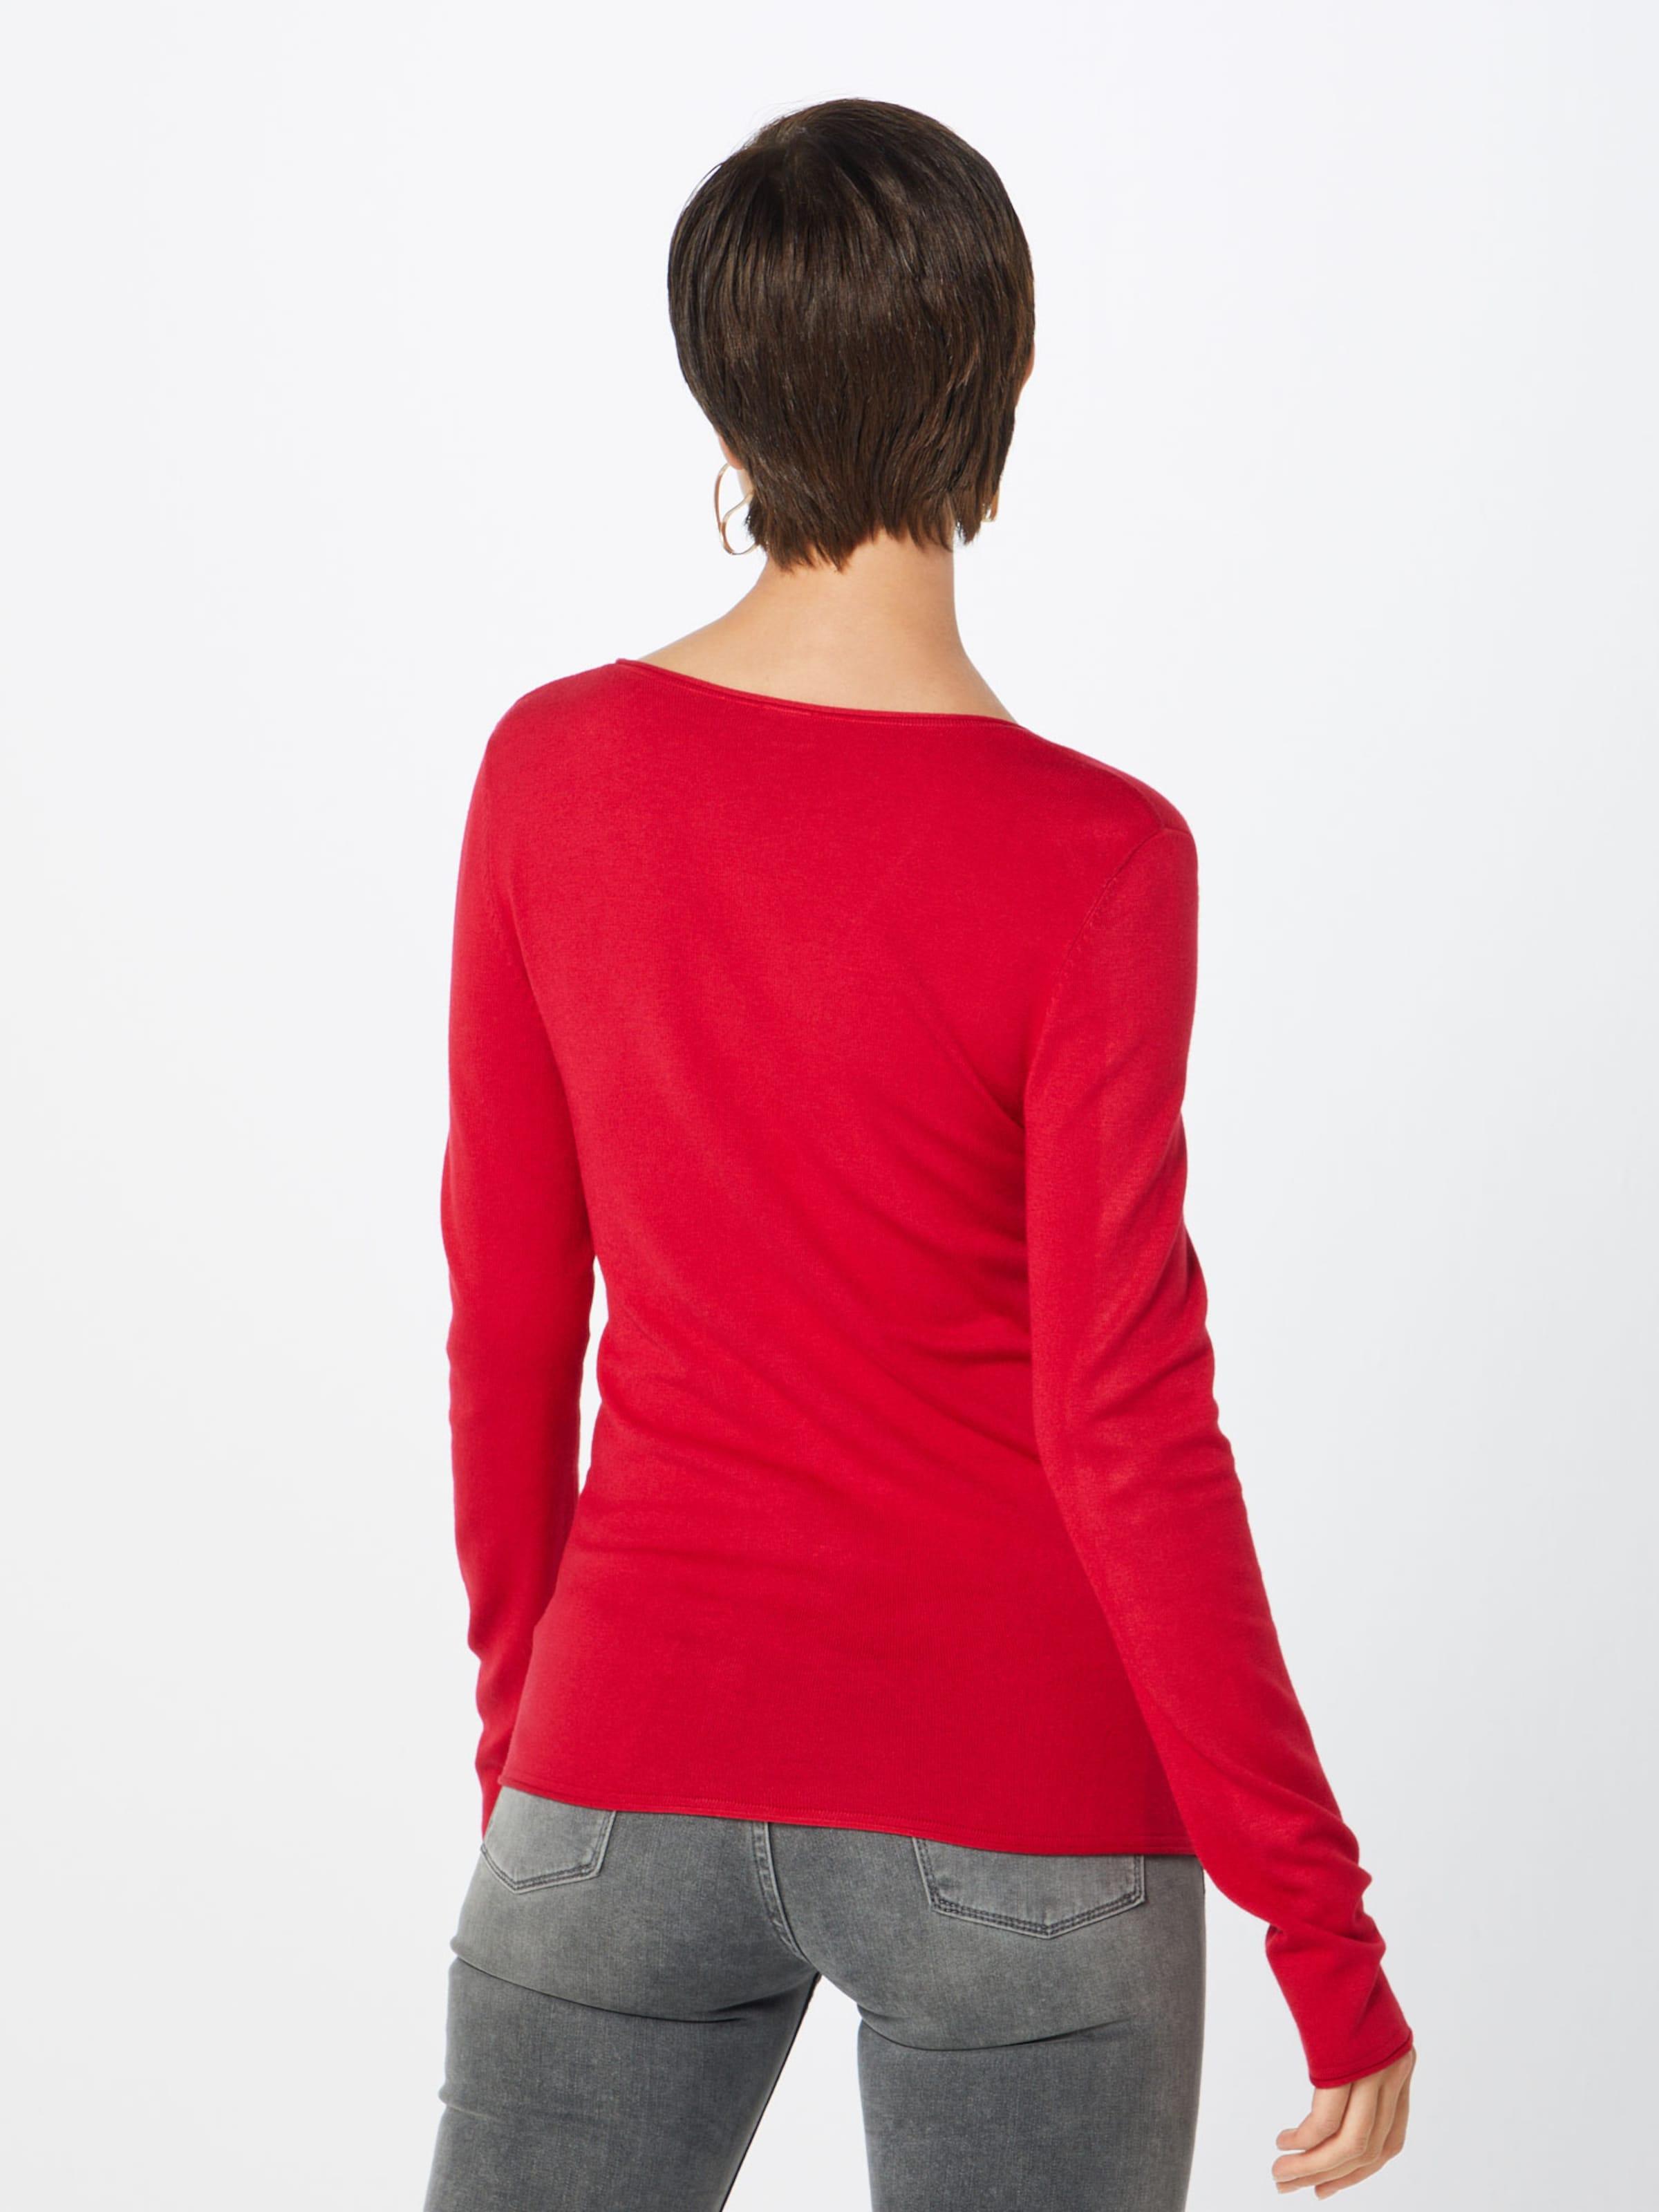 Label Black Pullover In S oliver Kirschrot VpMGqSUz